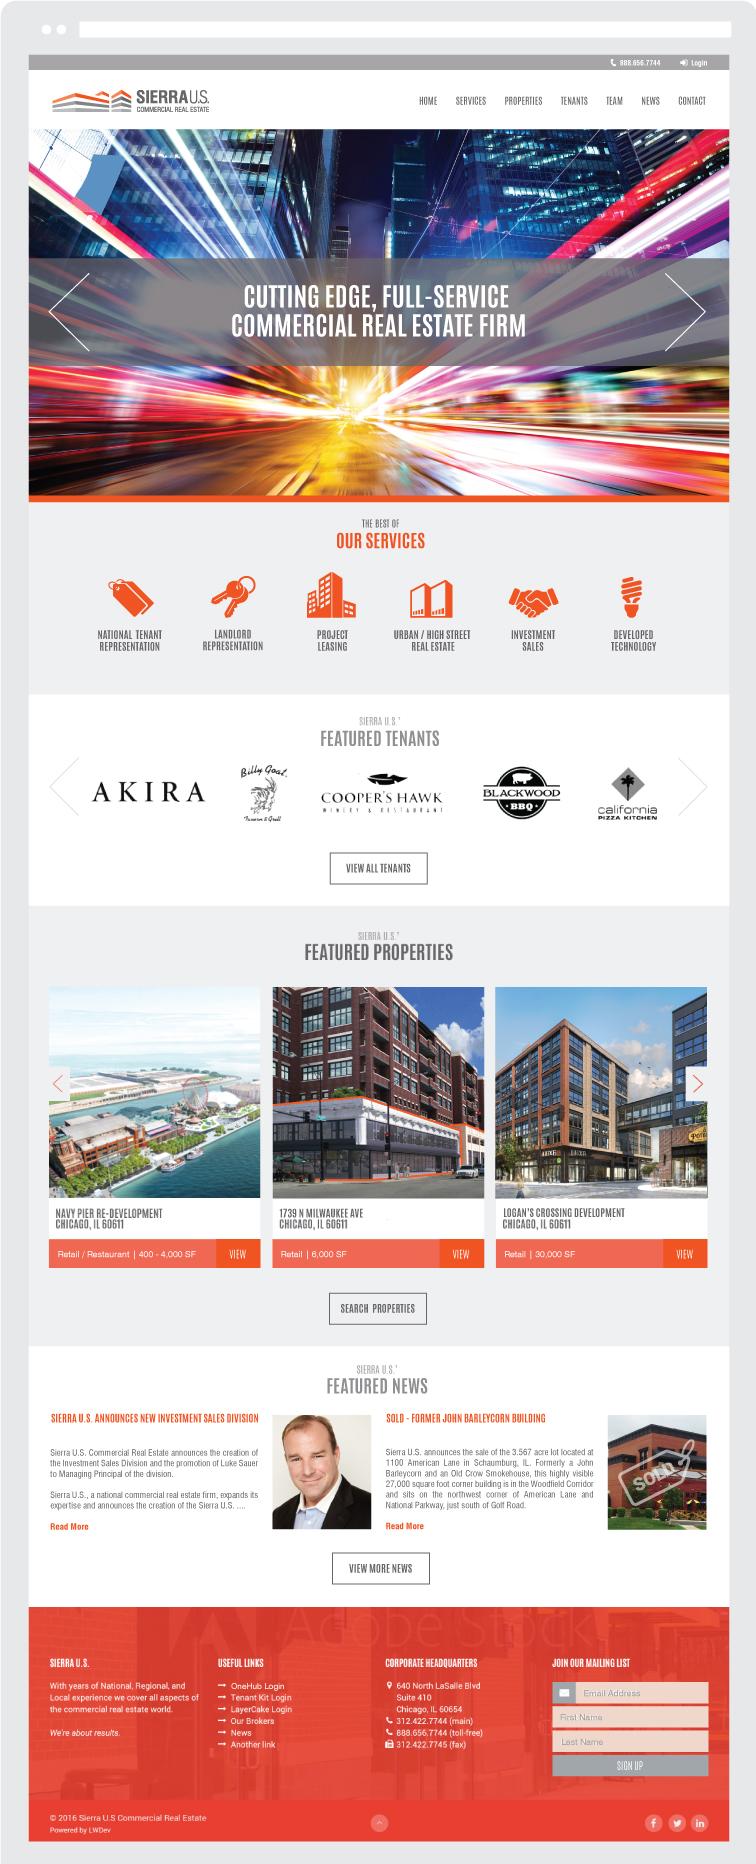 SierraUS_Case-study-web-home.jpg